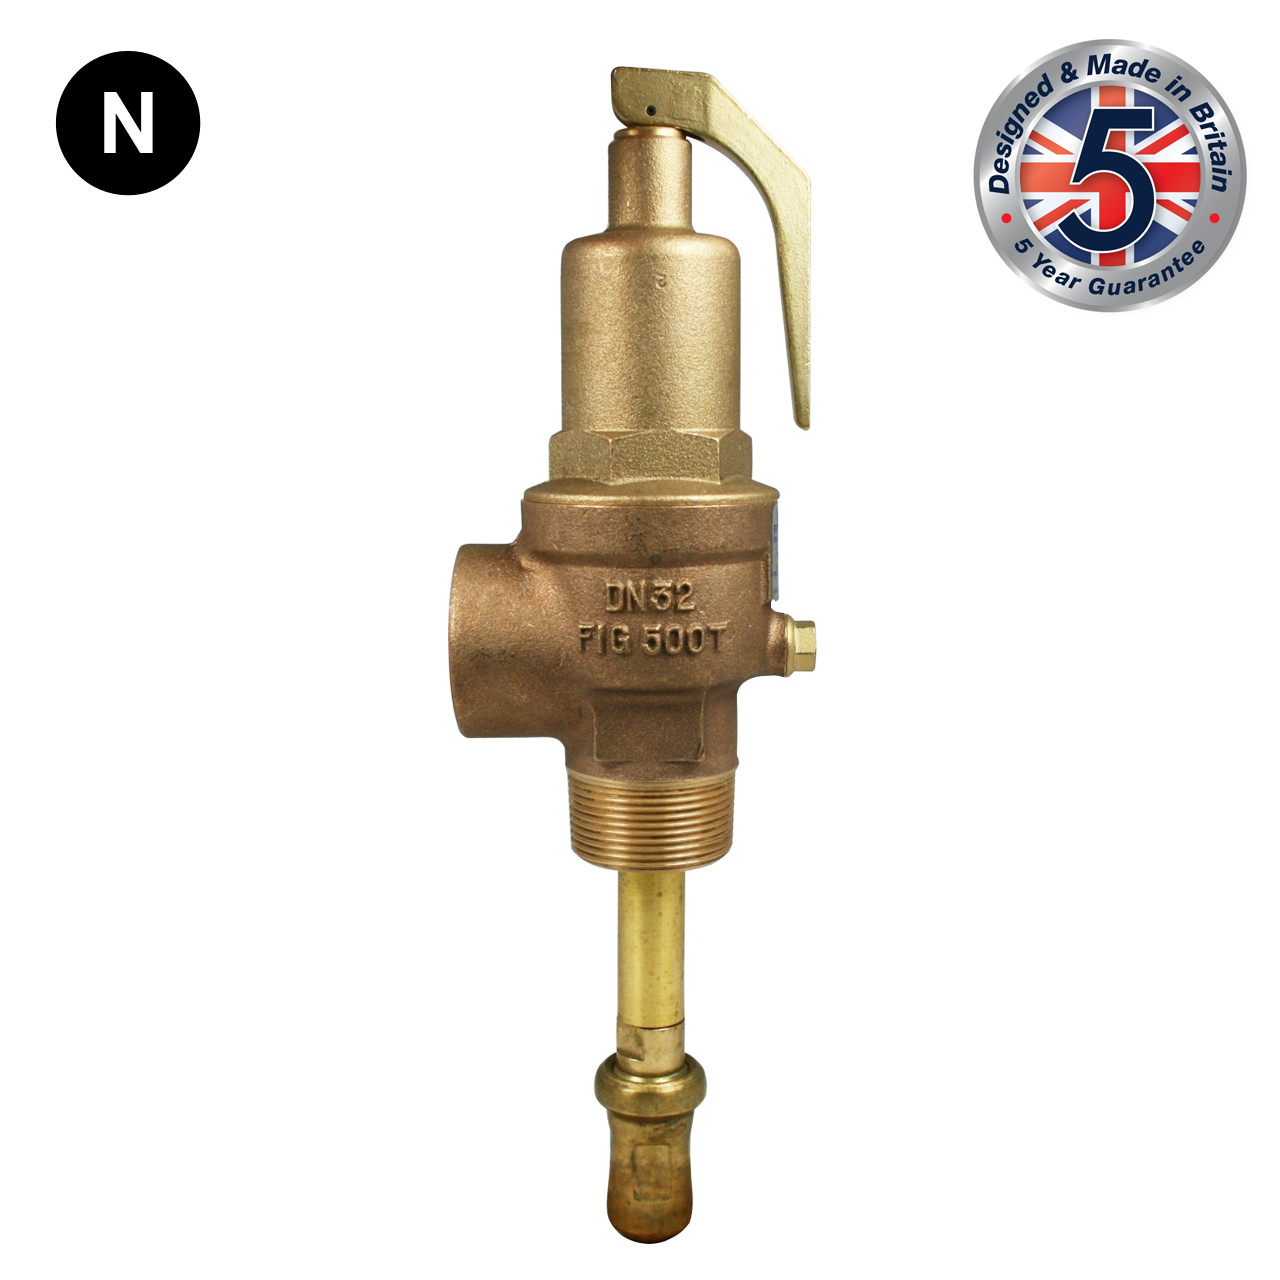 Nabic Fig 500T Combined Pressure & Temperature Relief